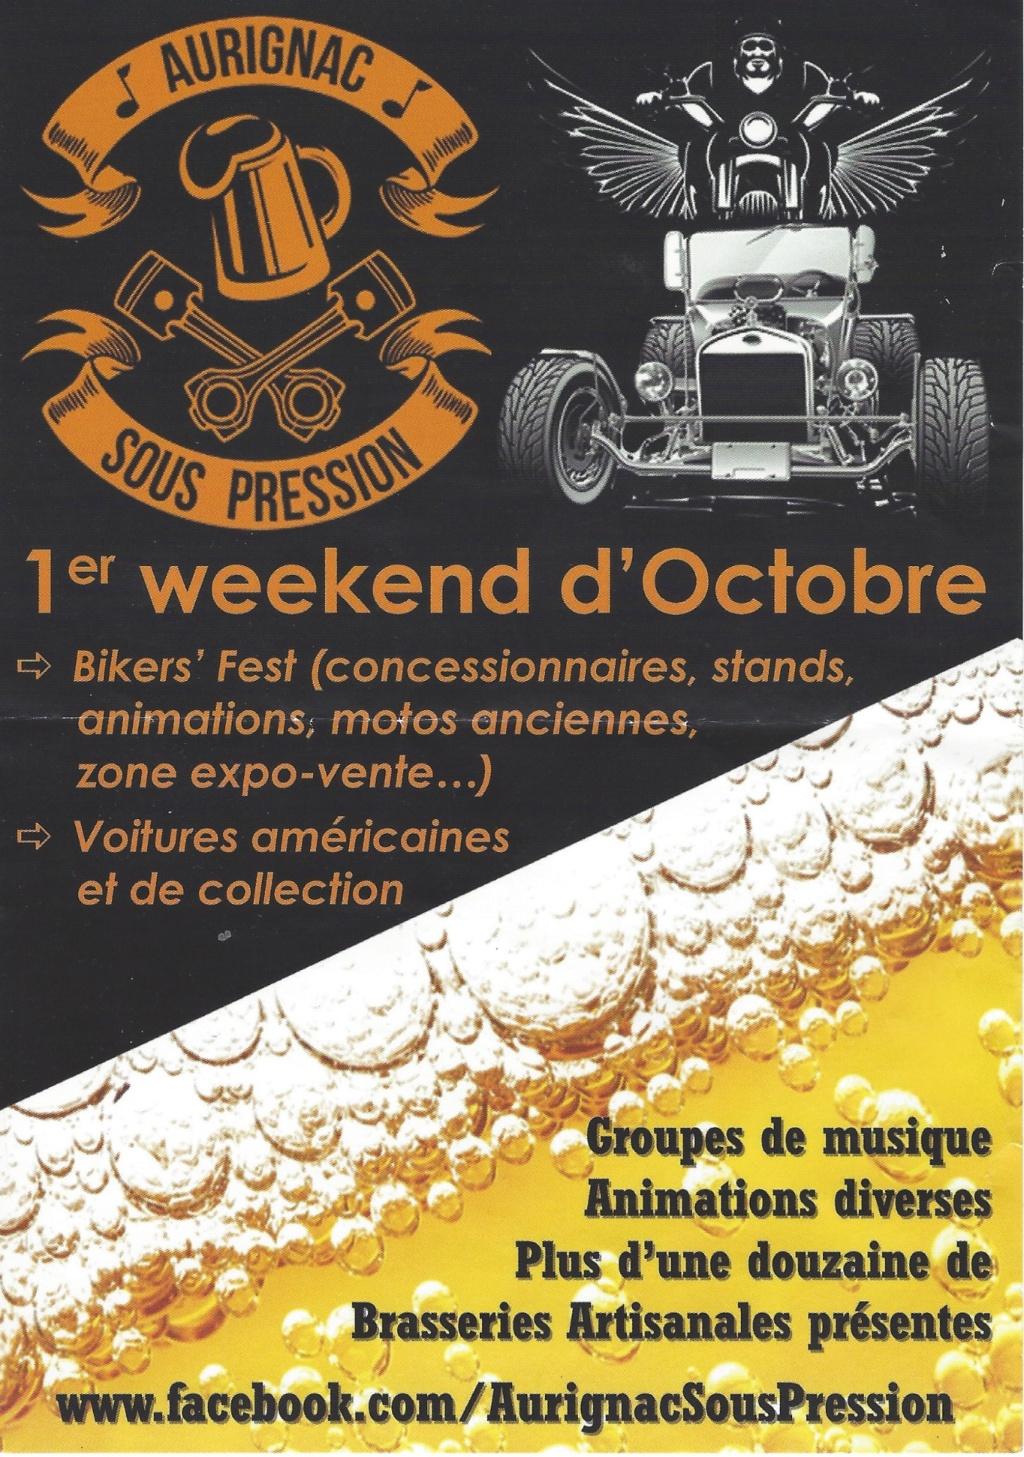 MANIFESTATION - Rassemblement - 5 & 6 Octobre 2019 - Aurignac 5d122c10